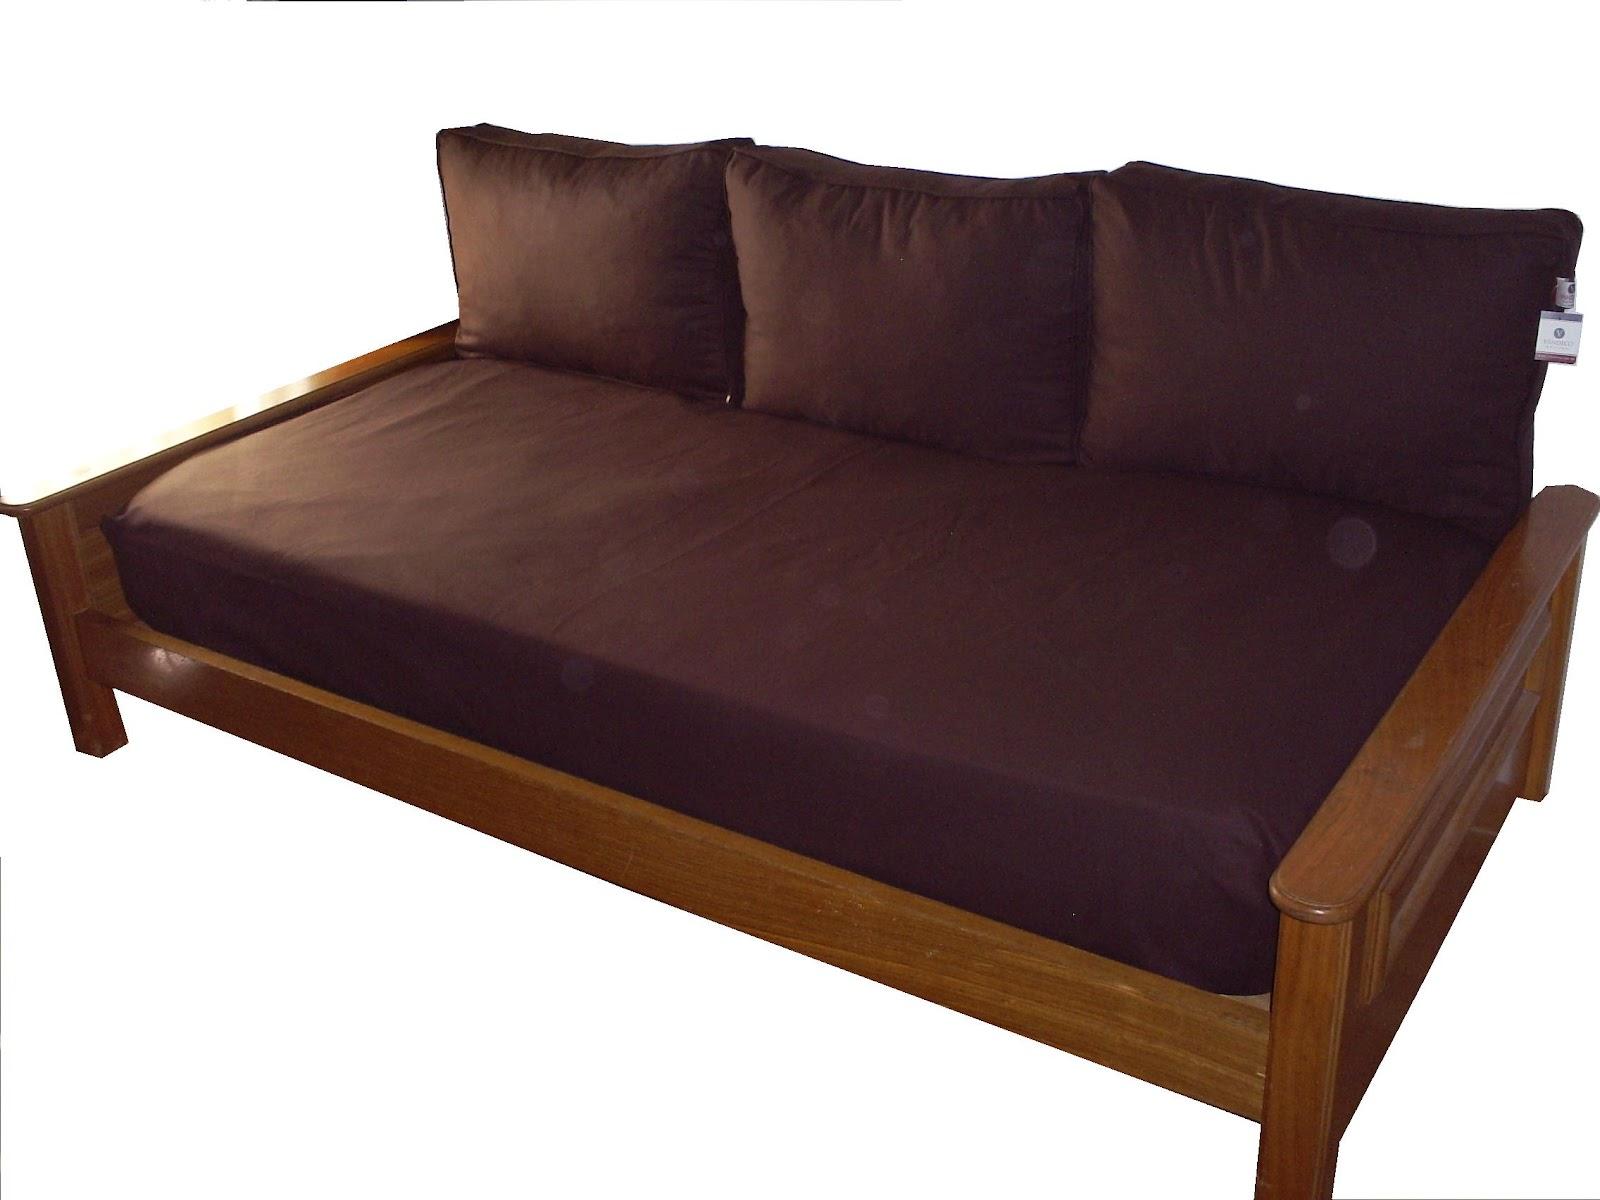 Mi casa decoracion fundas para divan - Como hacer fundas para sofas ...